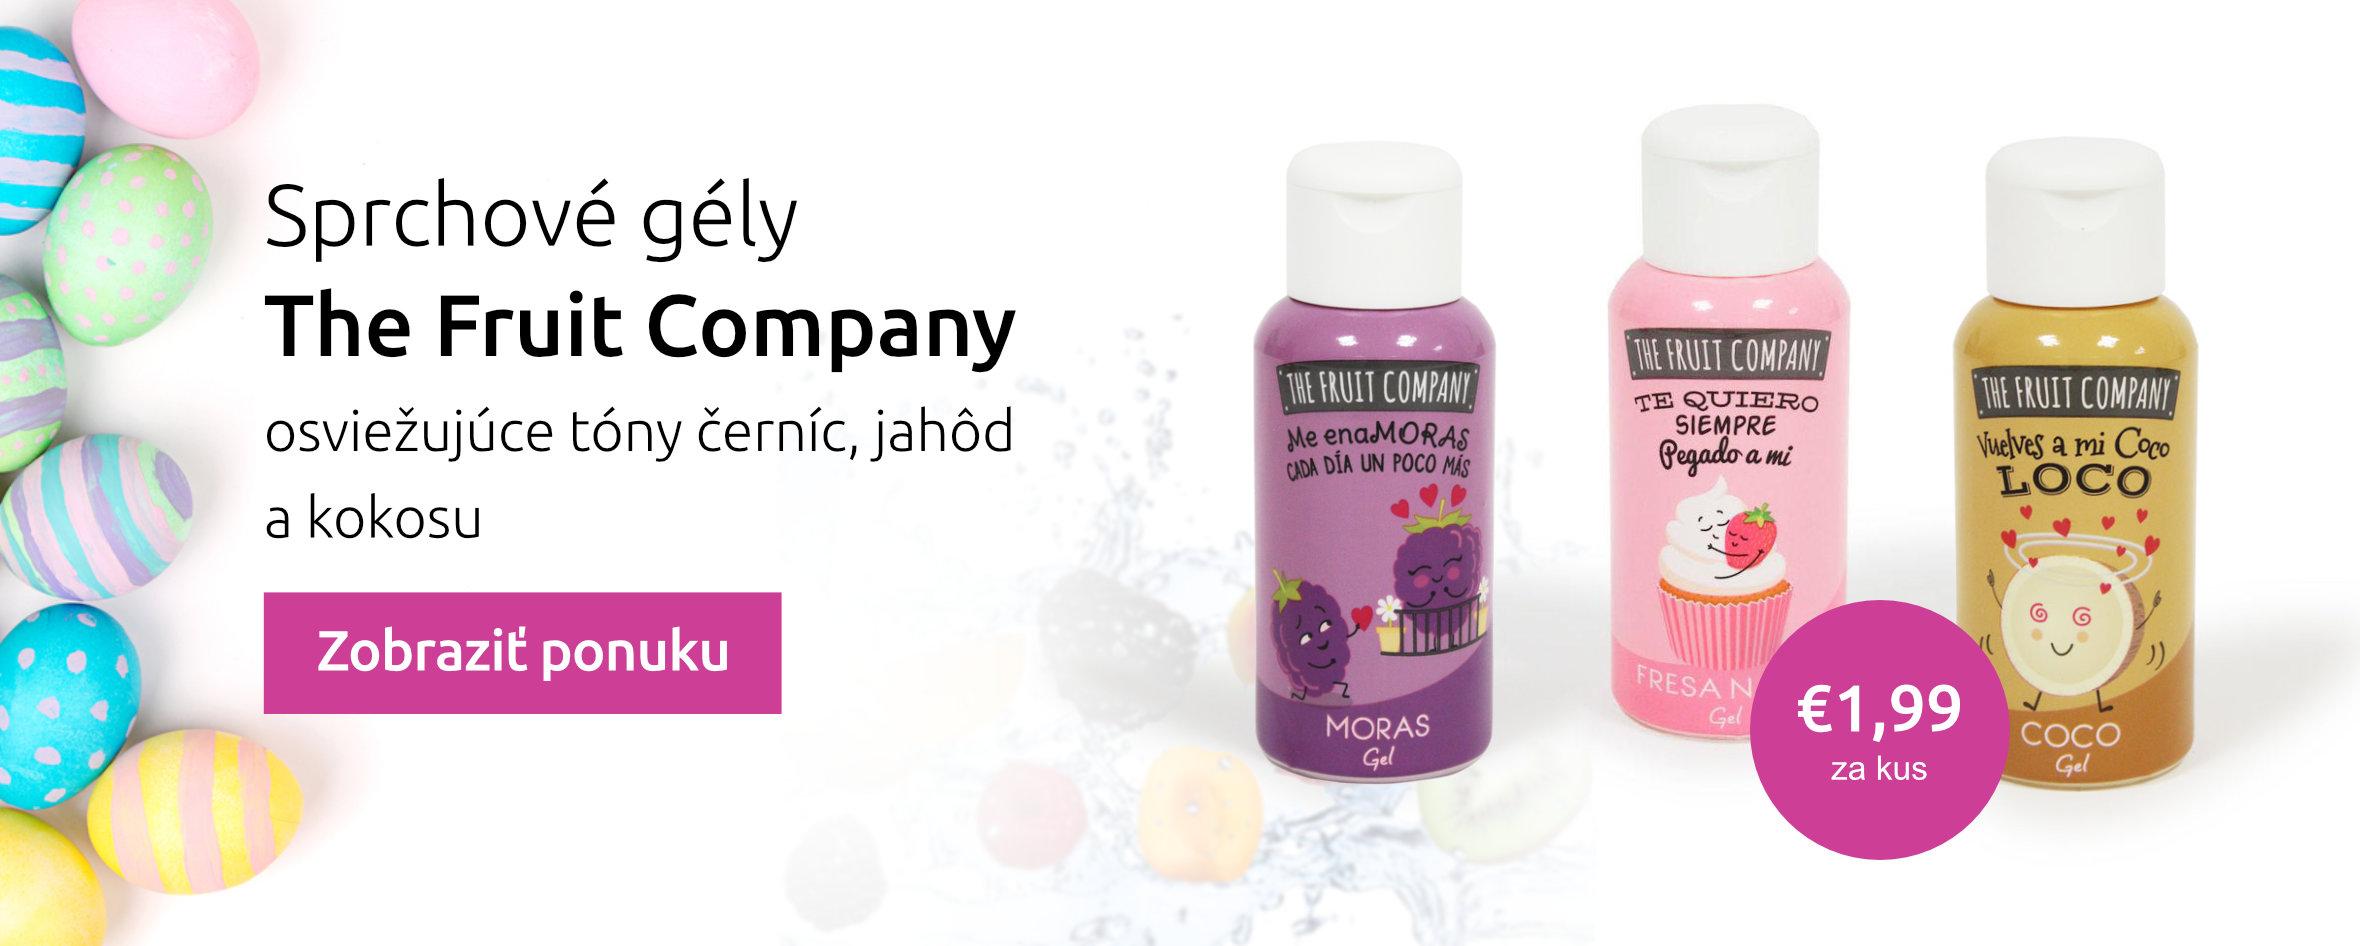 Sprchové gely The Fruit Company